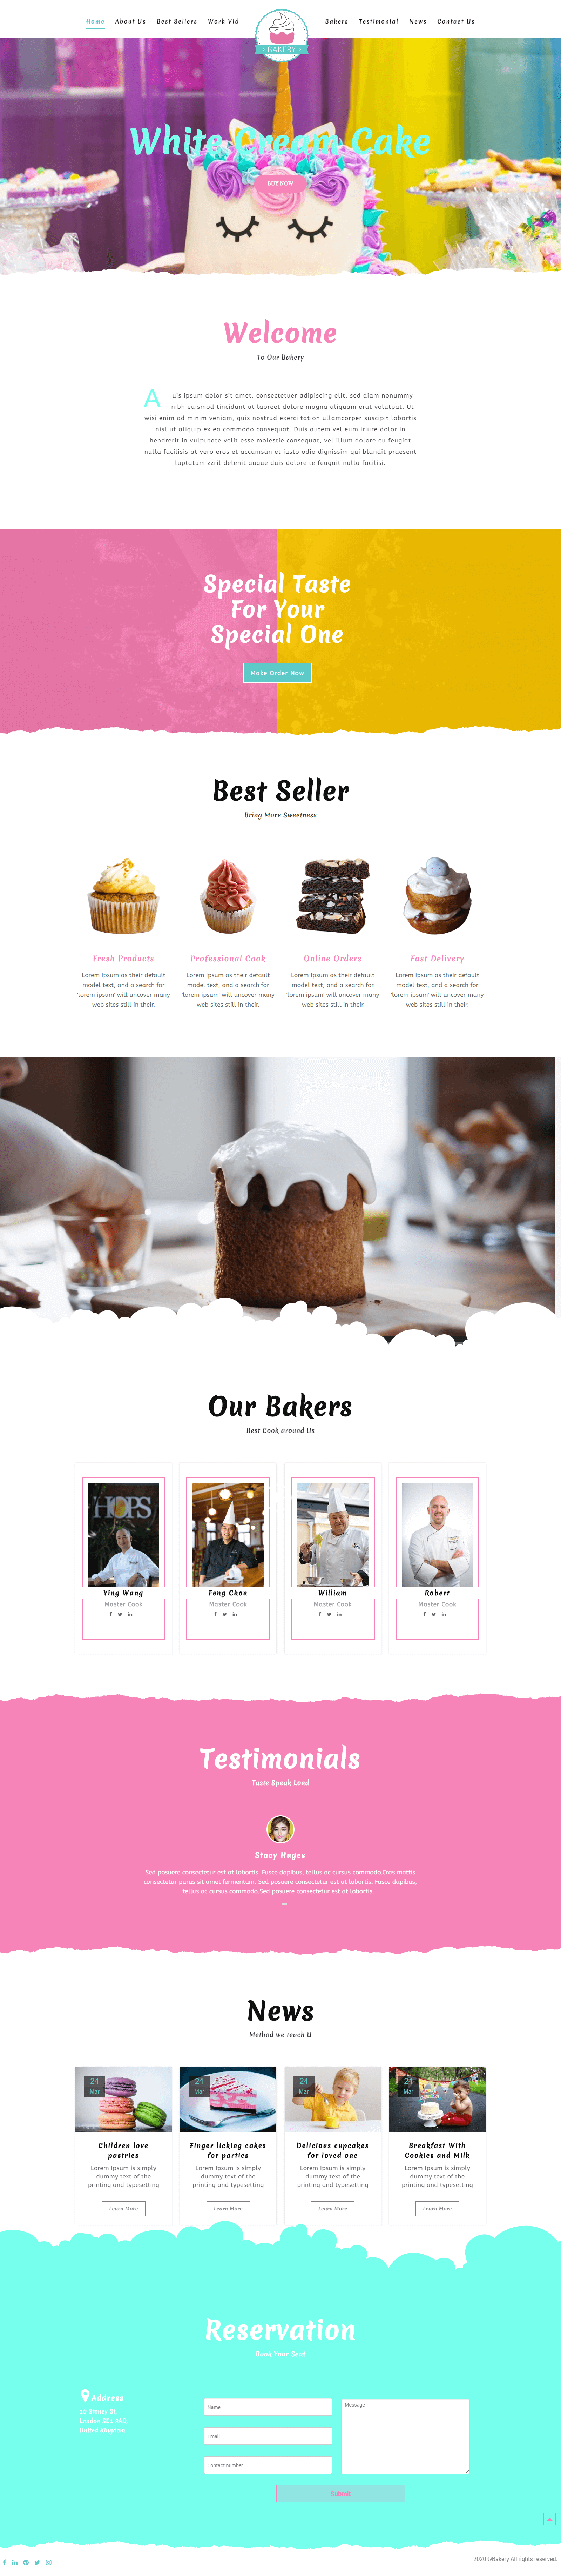 Oneline Bakery Shop